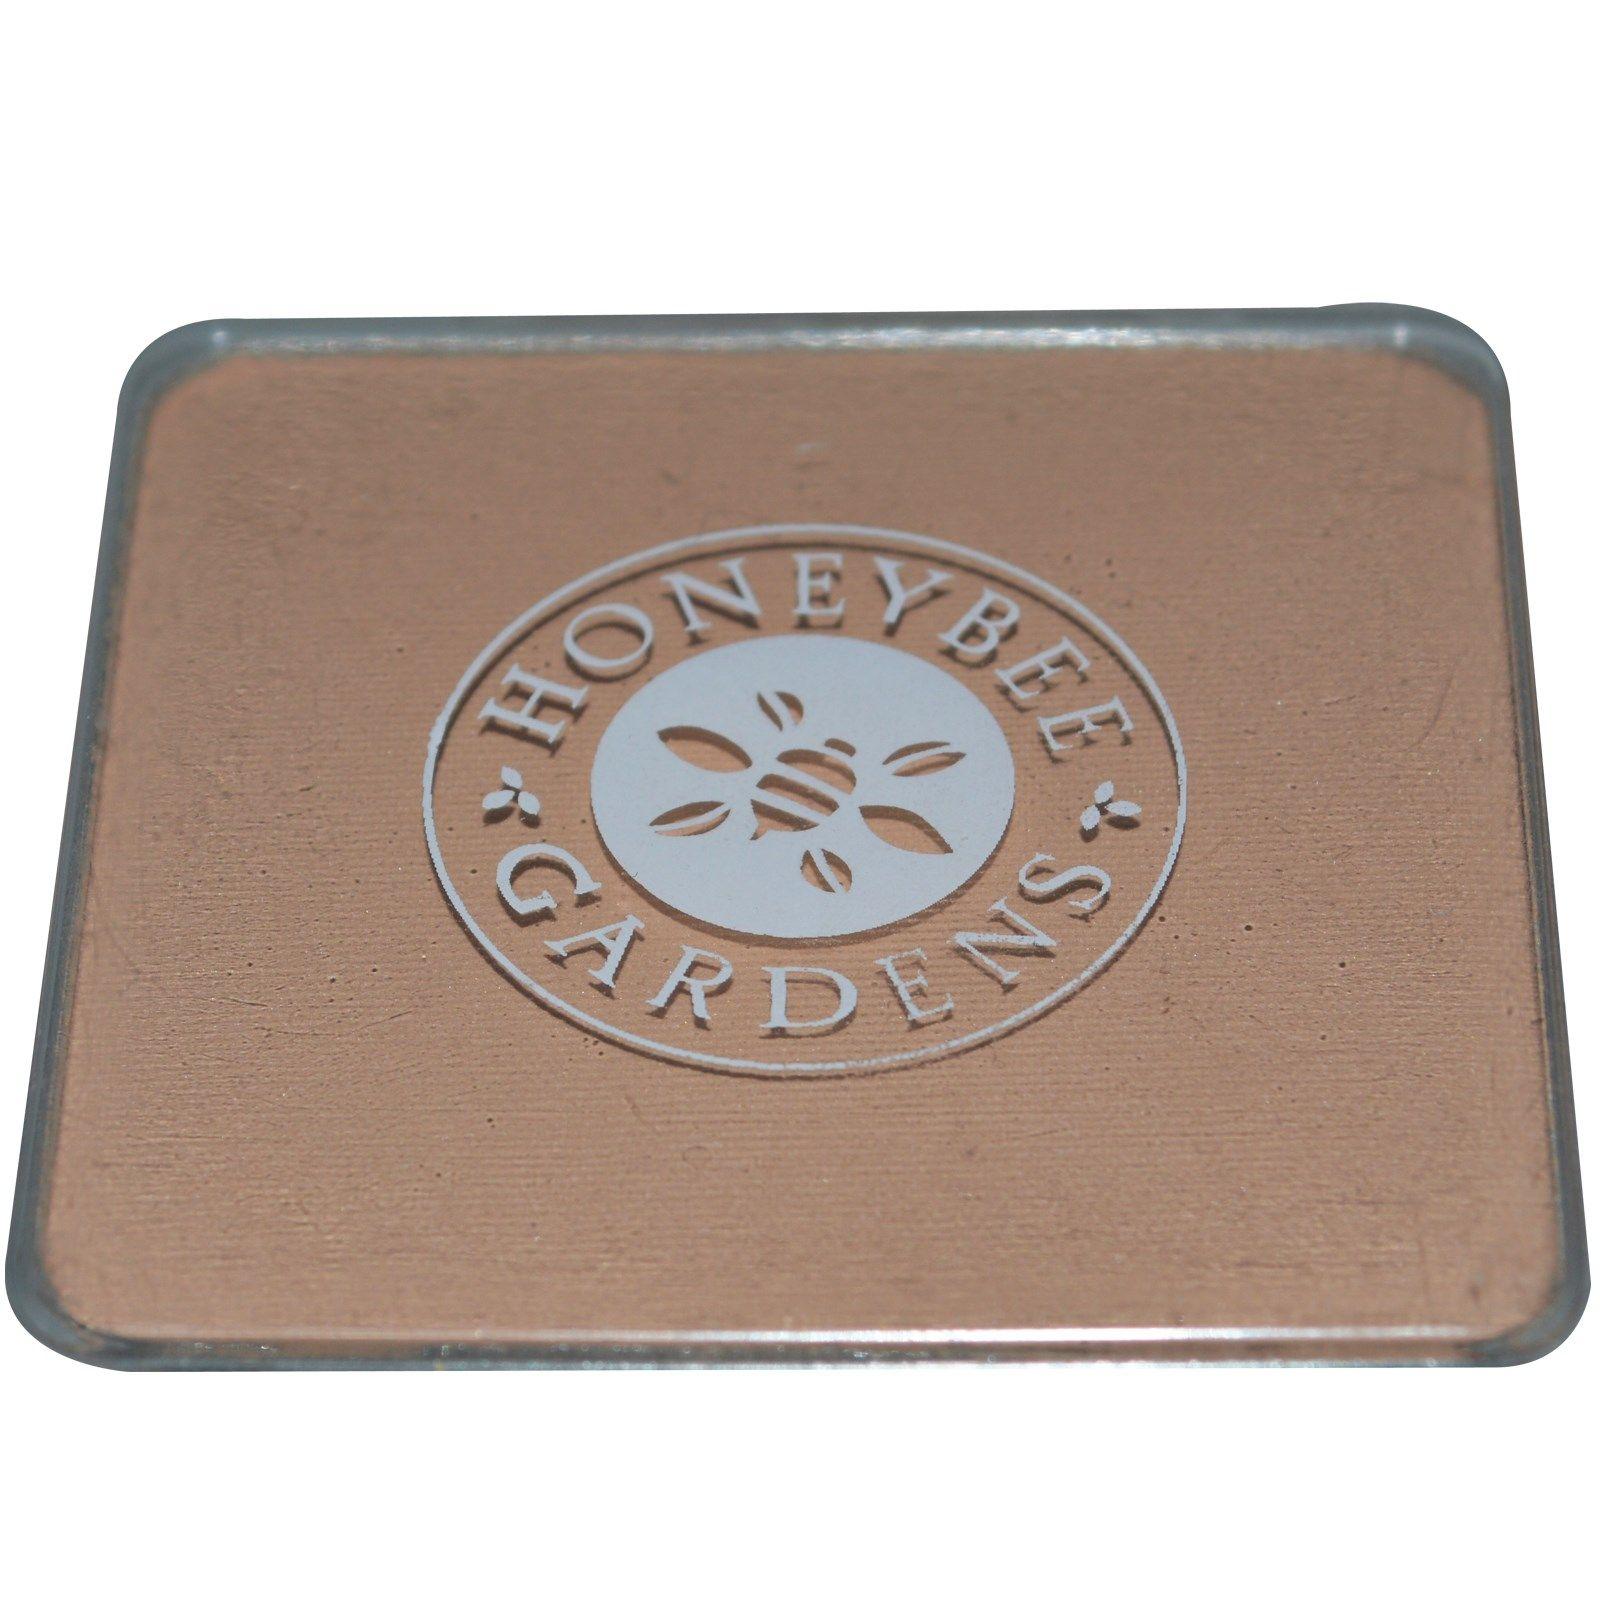 Honeybee Gardens, Pressed Mineral Powder, Malibu, 0.26 oz (7.5 g ...